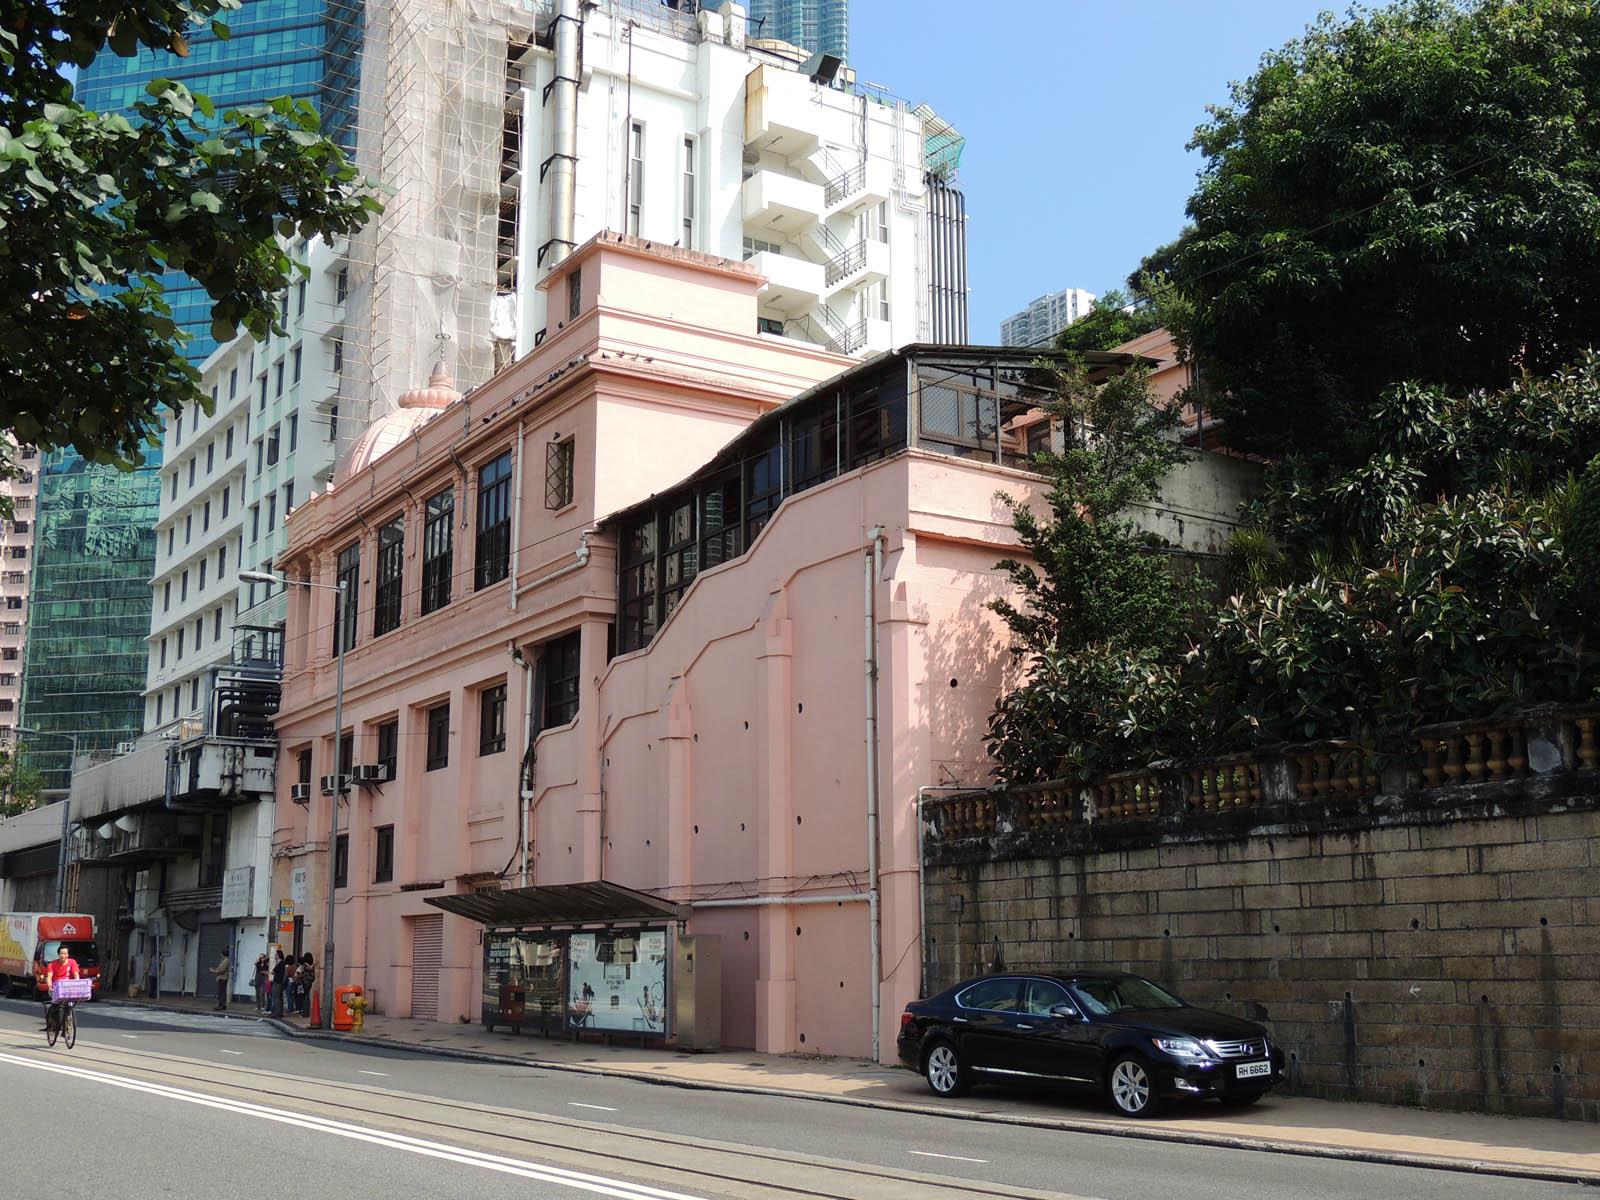 Hk Living Kast : Hinduism in hong kong wikipedia